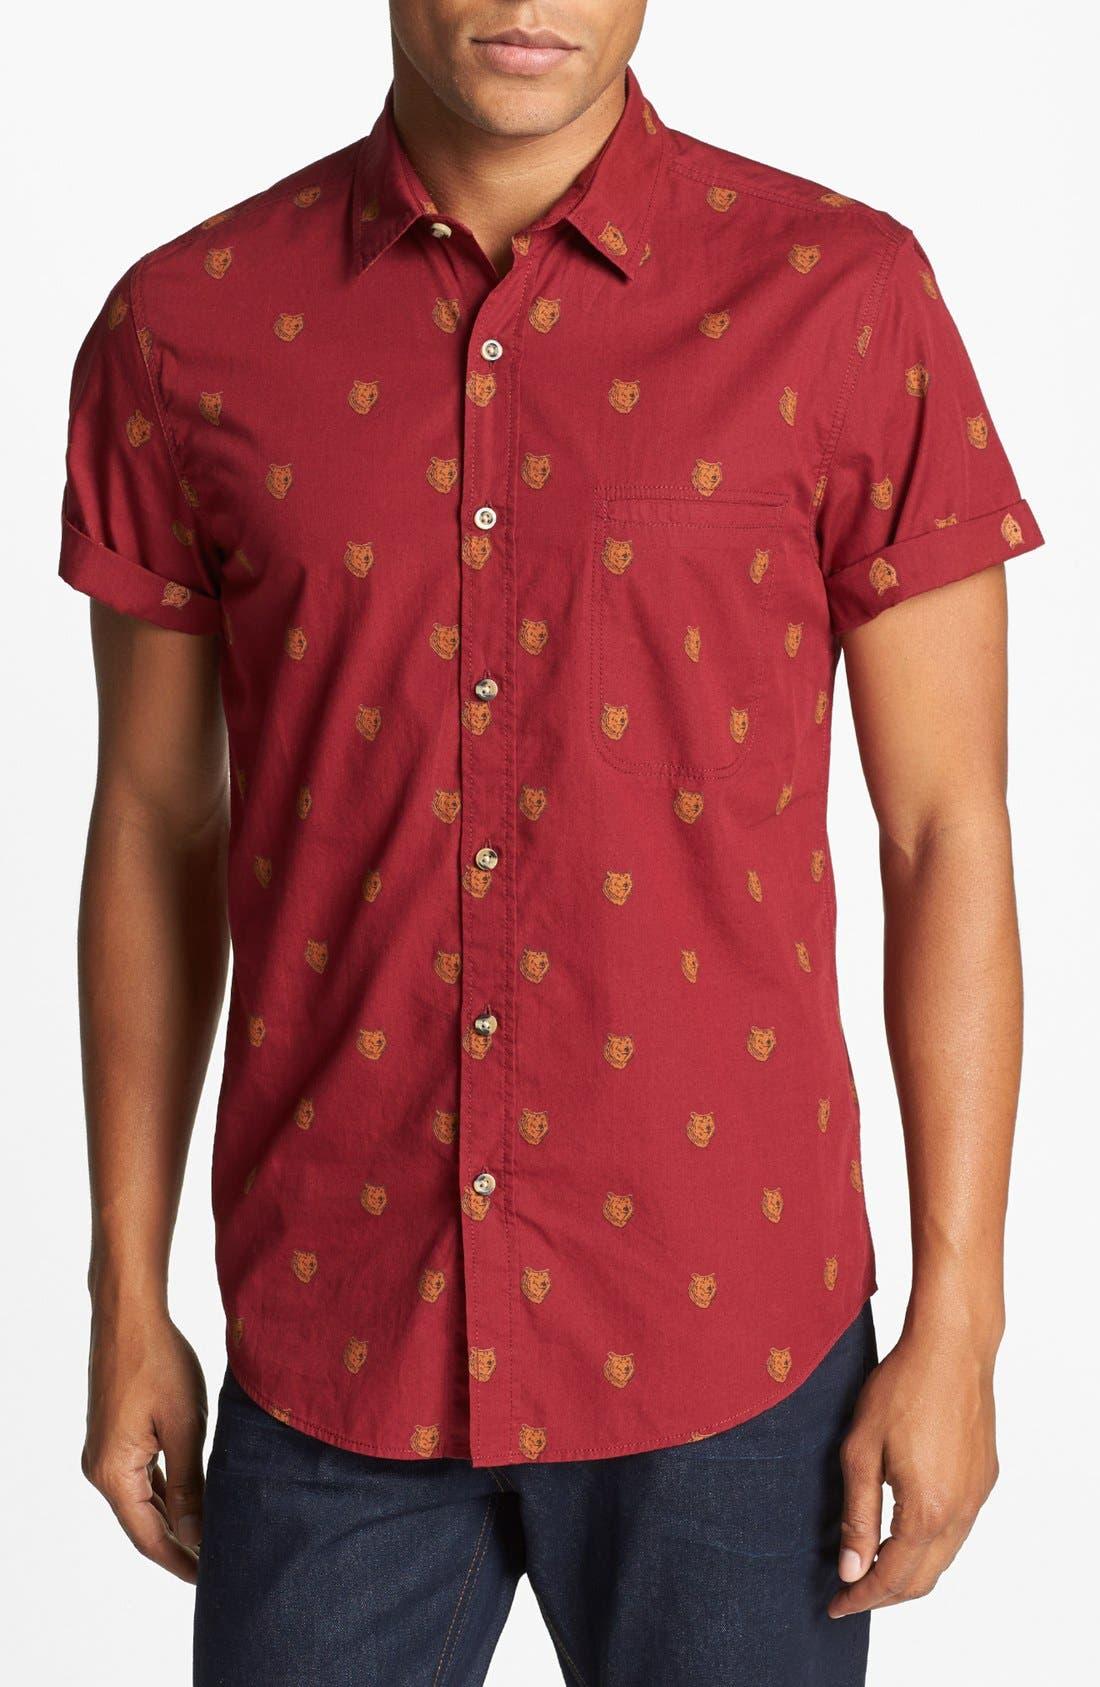 Alternate Image 1 Selected - Topman 'Bears - High Roller' Shirt